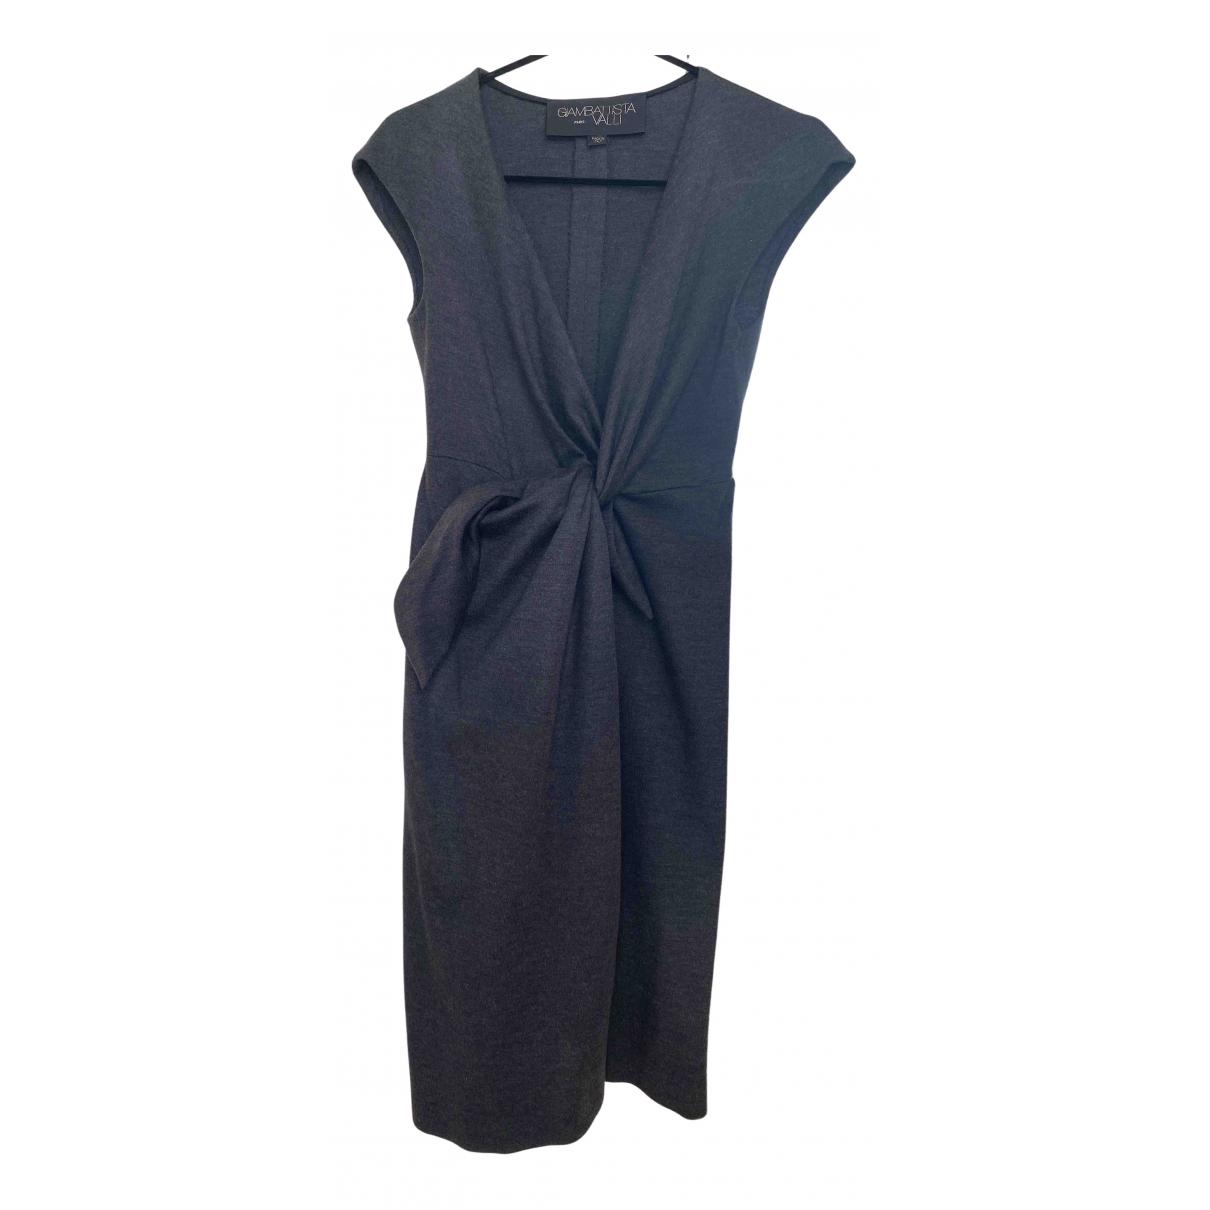 Giambattista Valli N Anthracite Wool dress for Women 40 IT